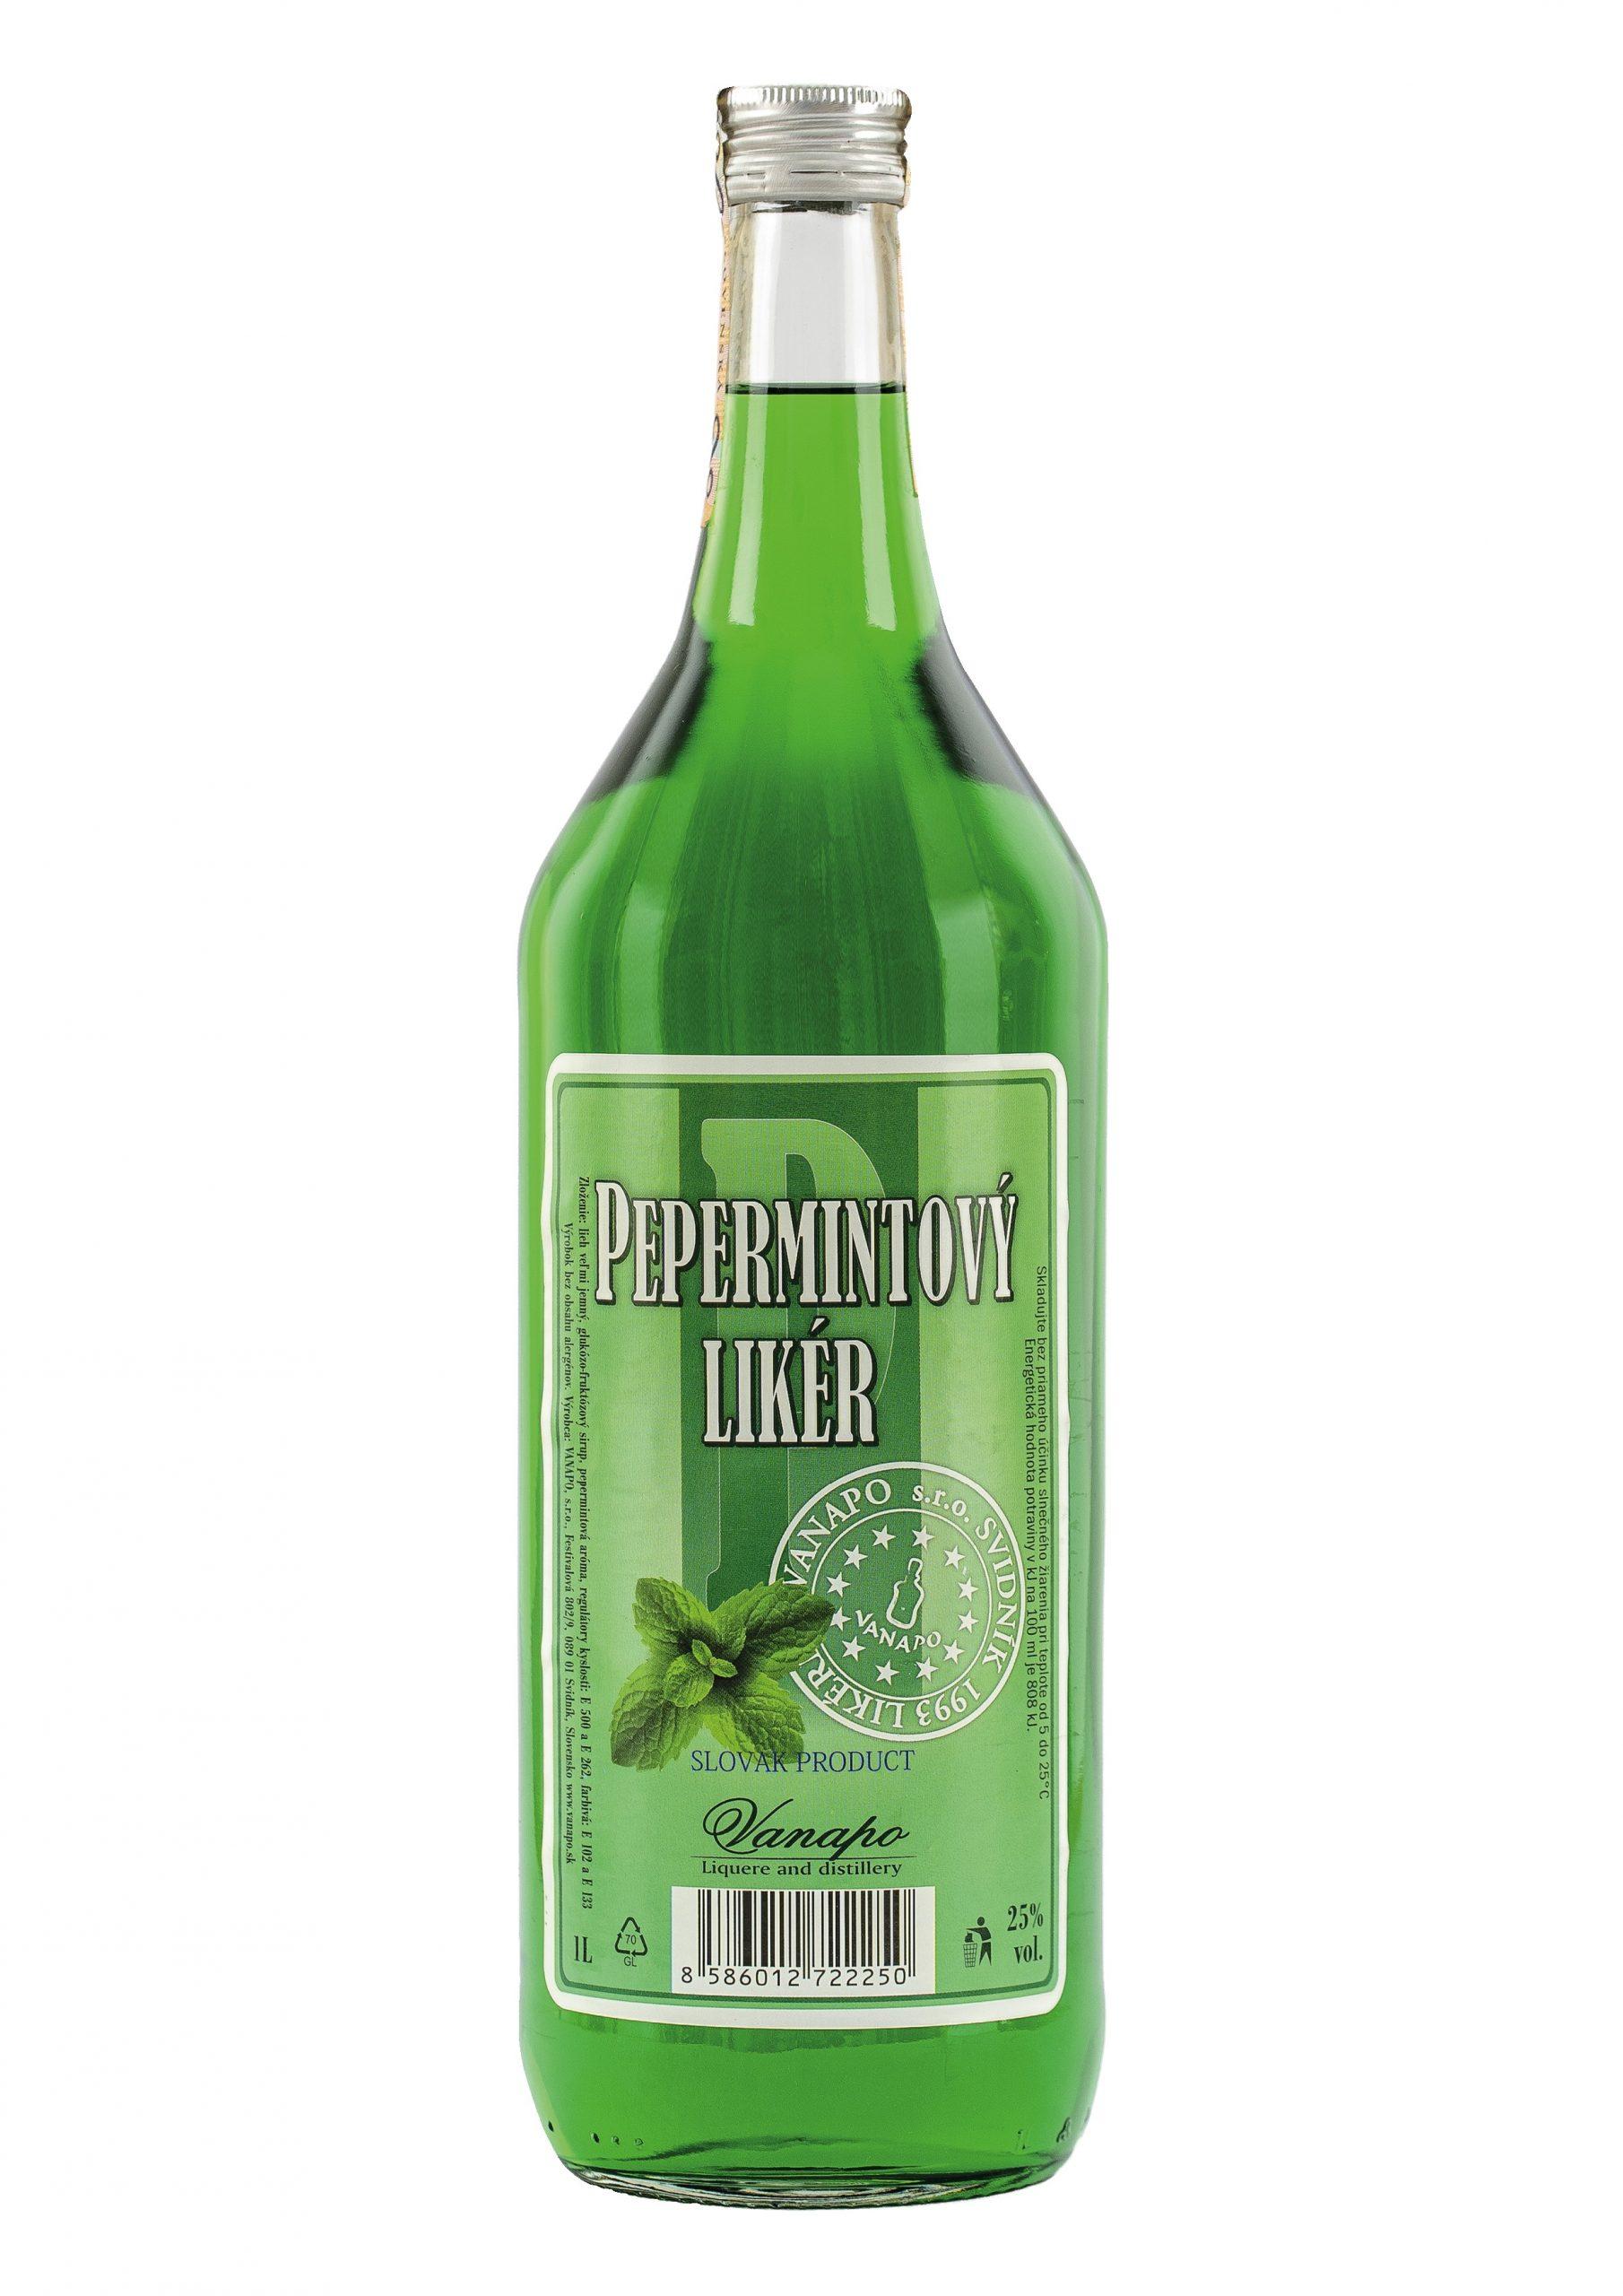 Pepermintovy liker 25 1L scaled 1 - Pepermint likér